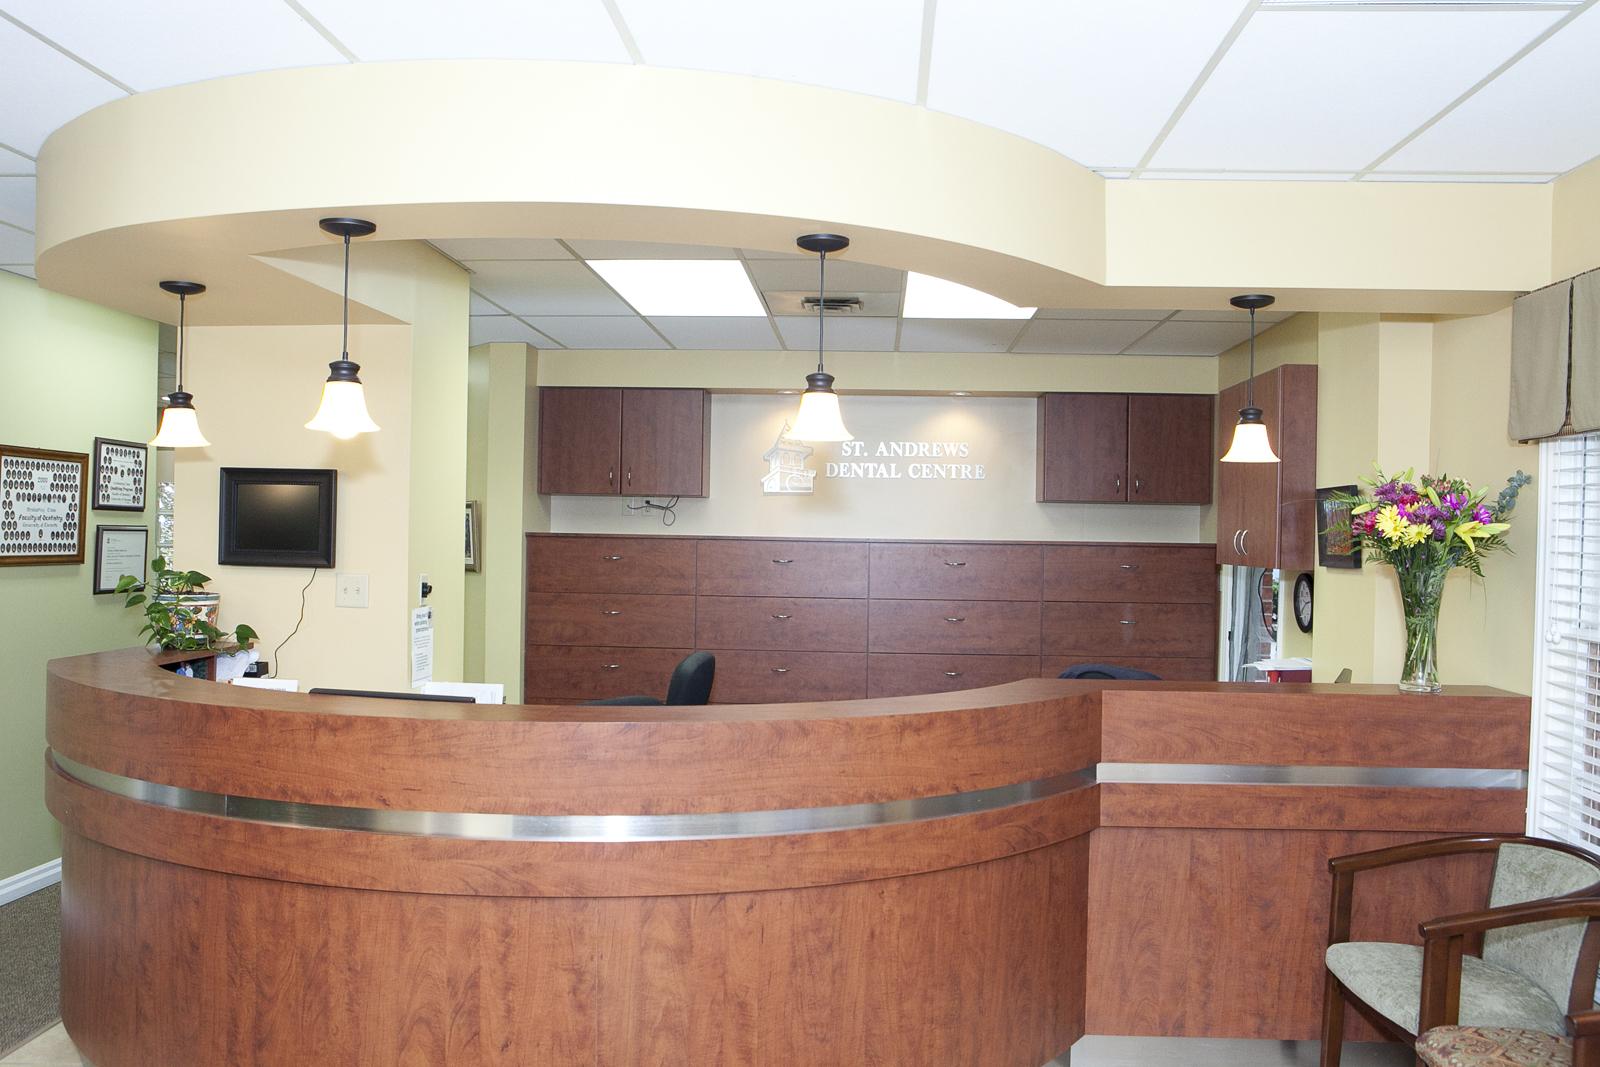 St Andrew's Dental Centre in Aurora